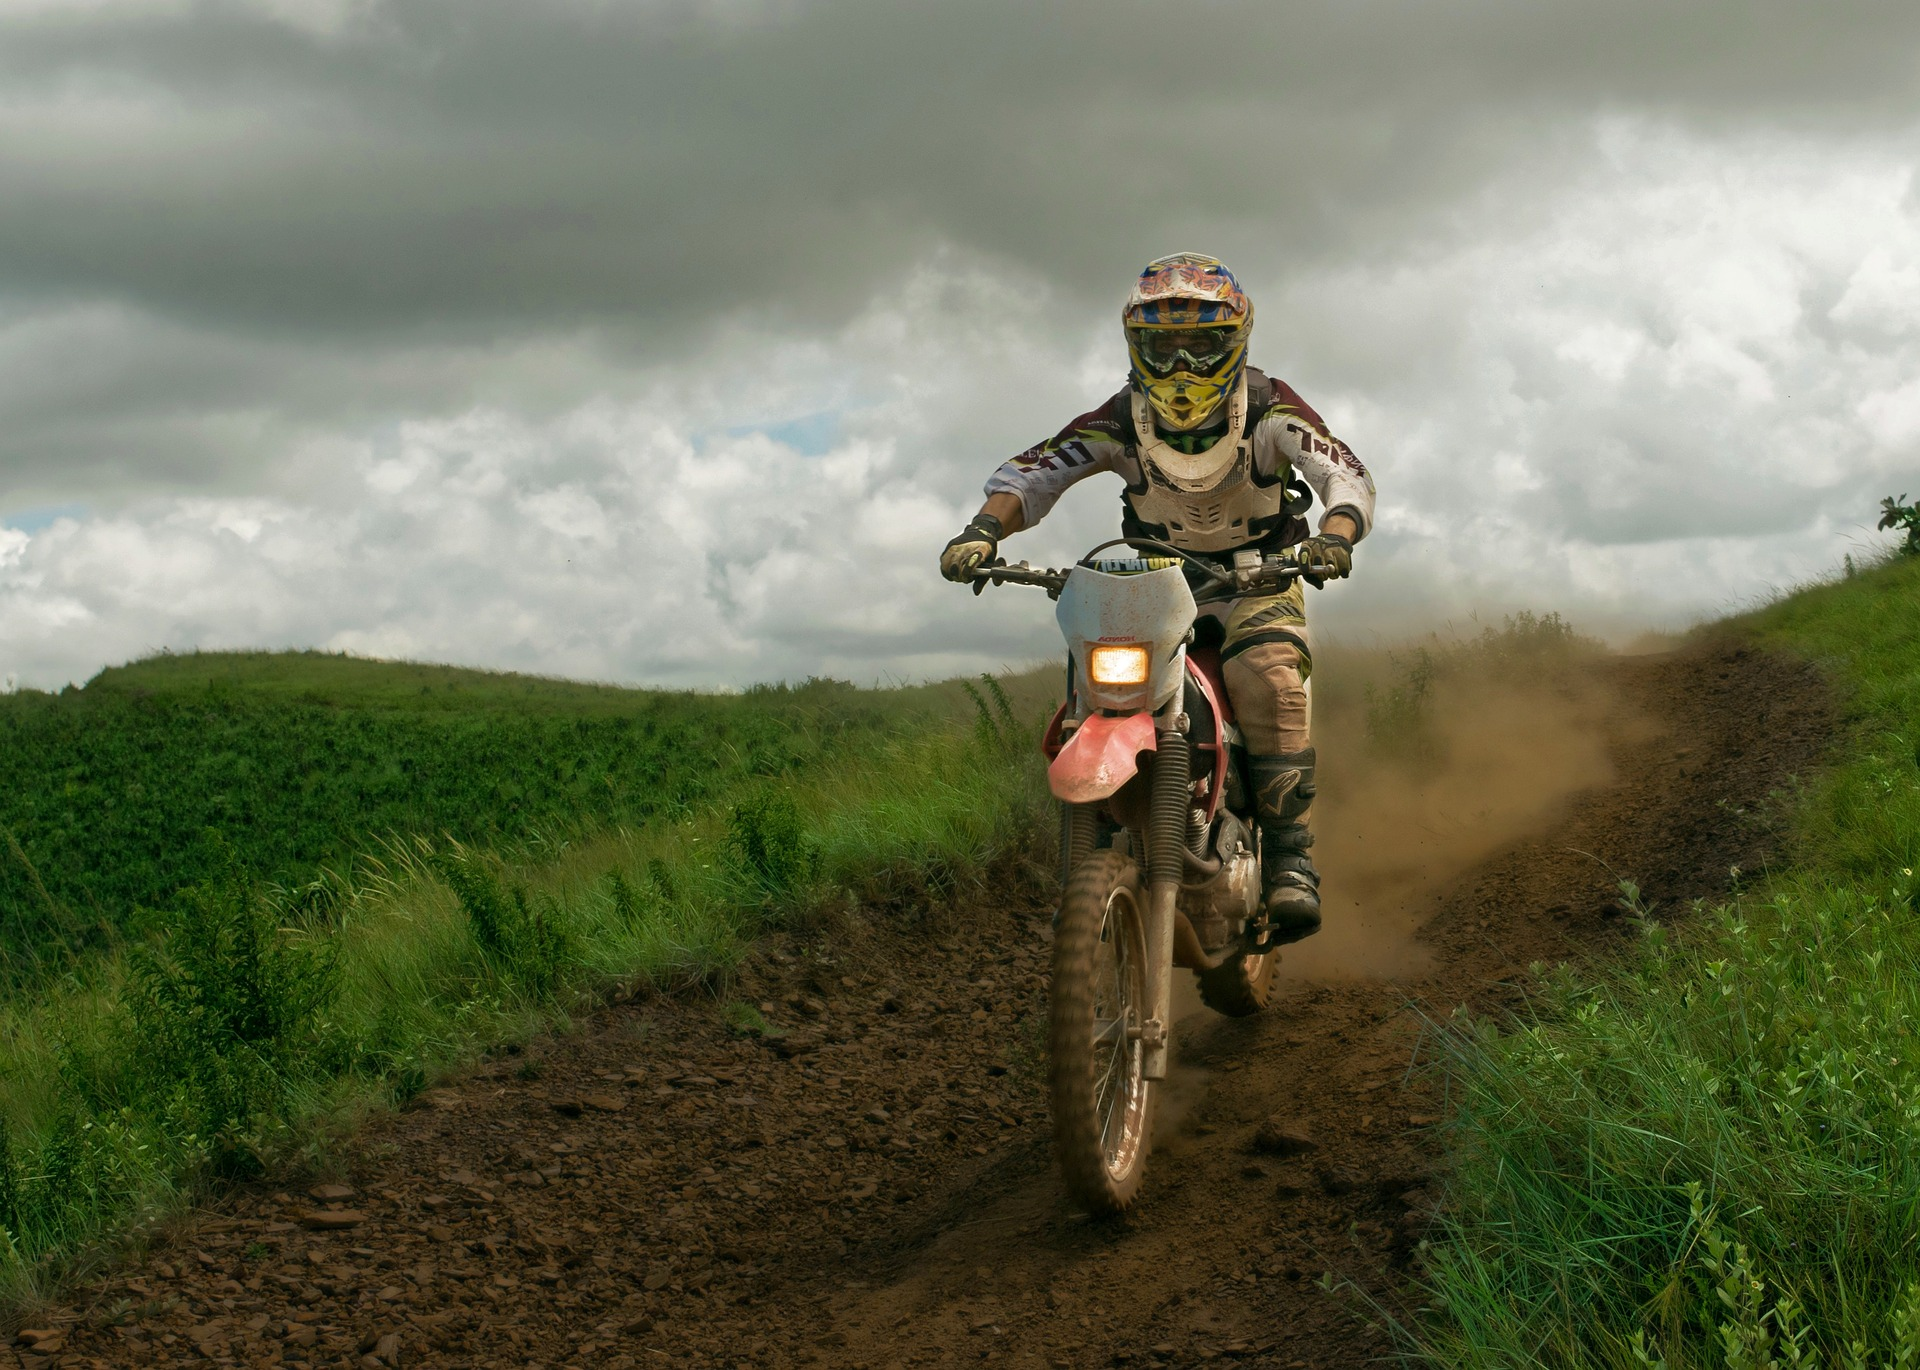 Adventure_Rider_Radio_Motorcycle_Dirt_Downhill.jpg